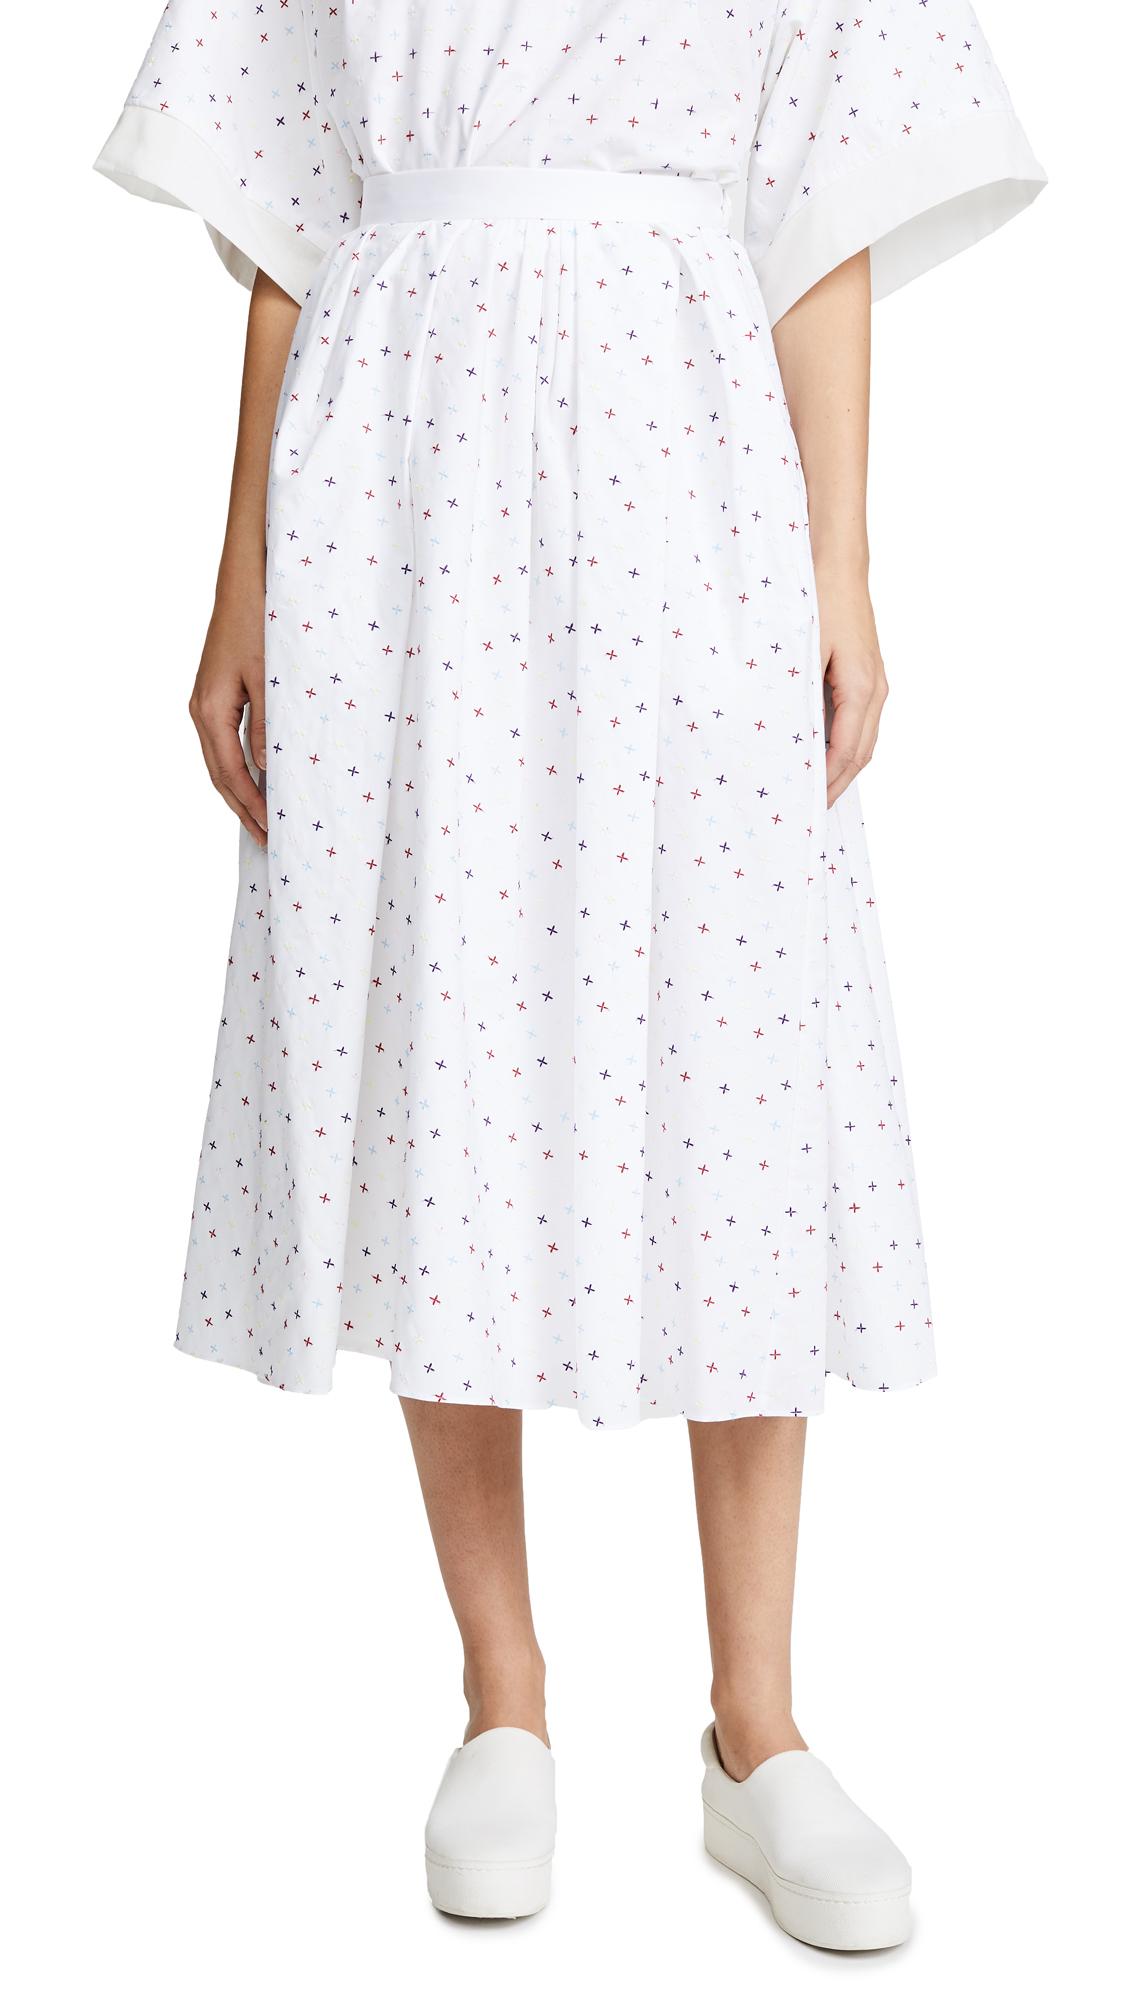 Adam Lippes Gathered Midi Skirt In White Multi